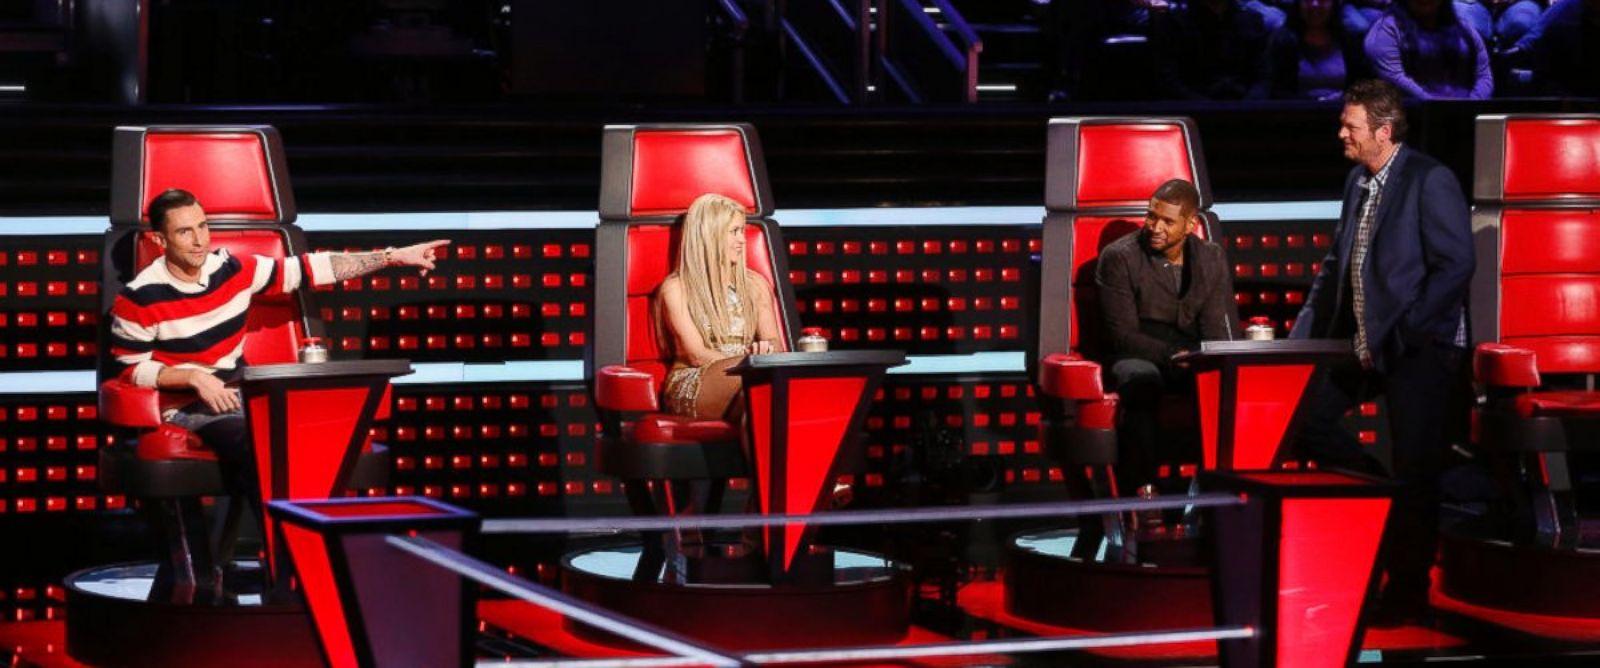 PHOTO: From left, judges Adam Levine, Shakira, Usher and Blake Shelton on The Voice, March 18, 2014.